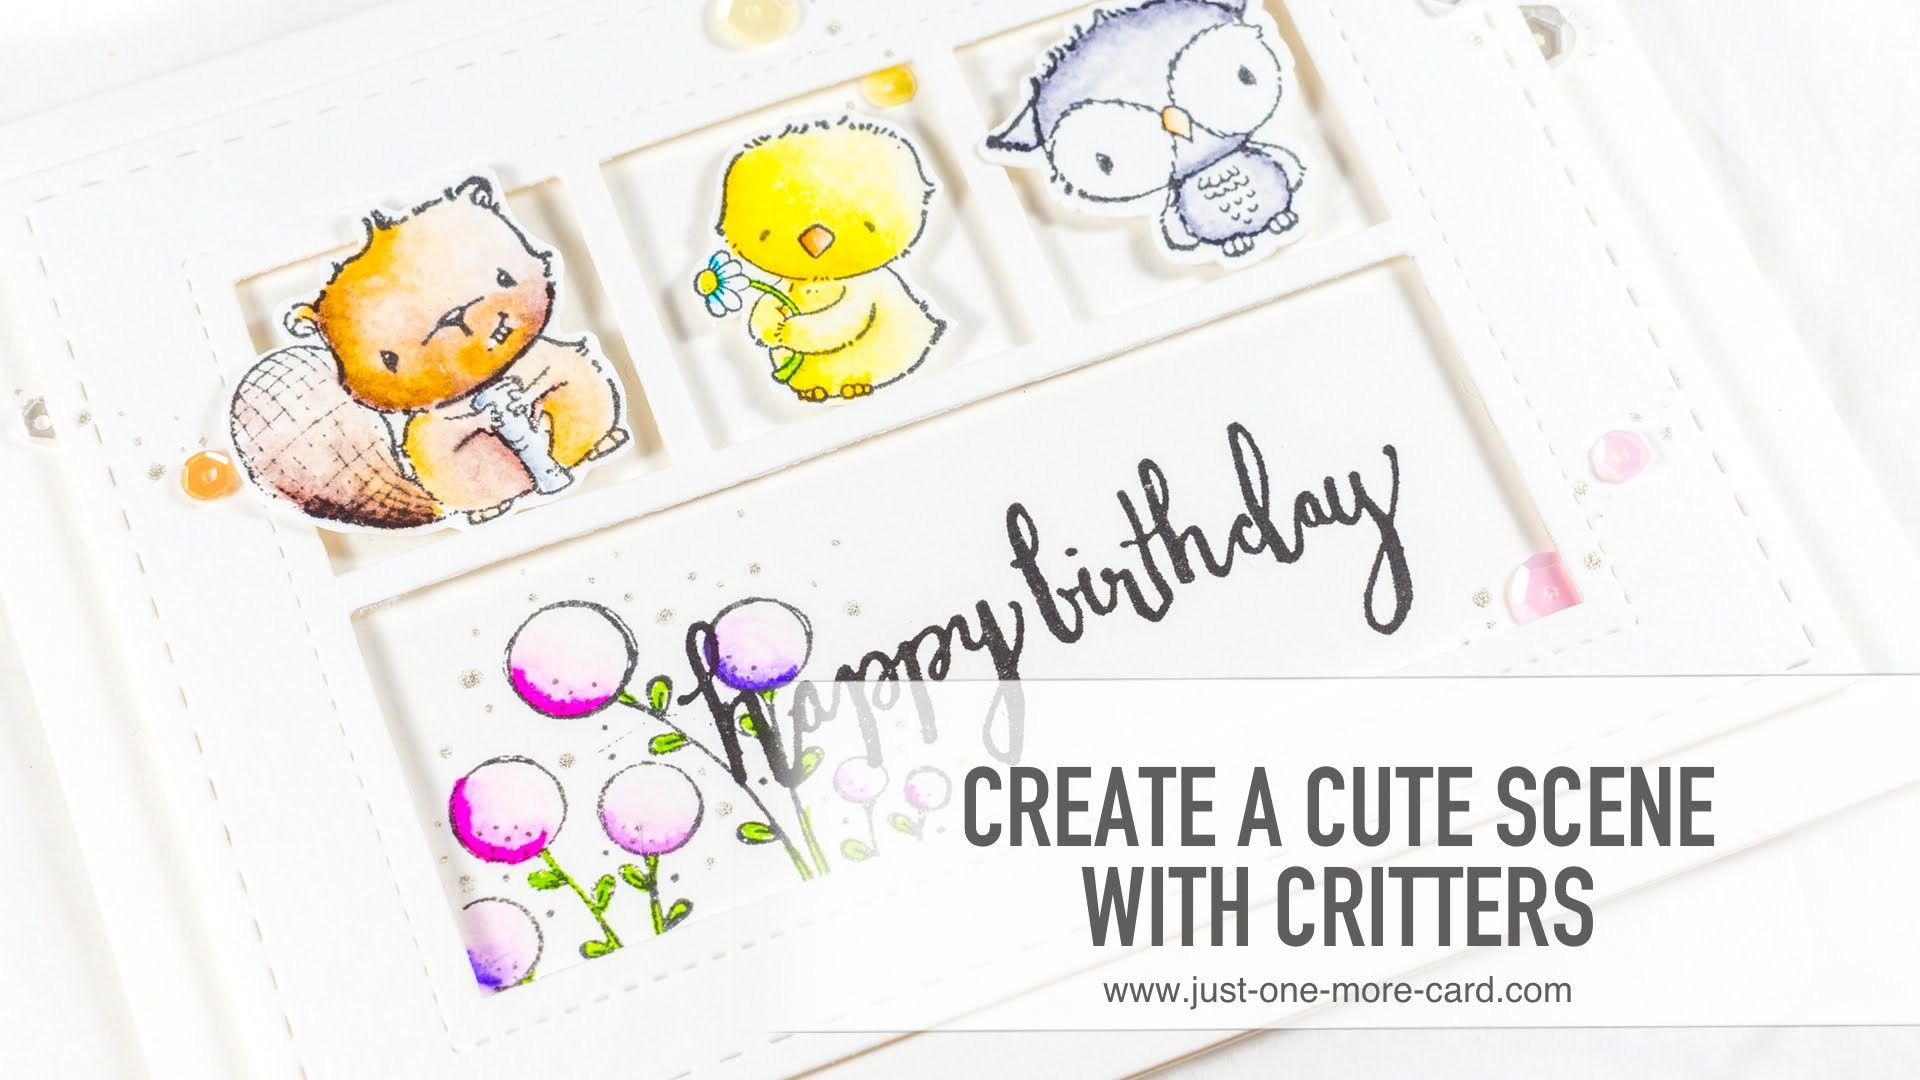 How to Create a Cute Critter Scene